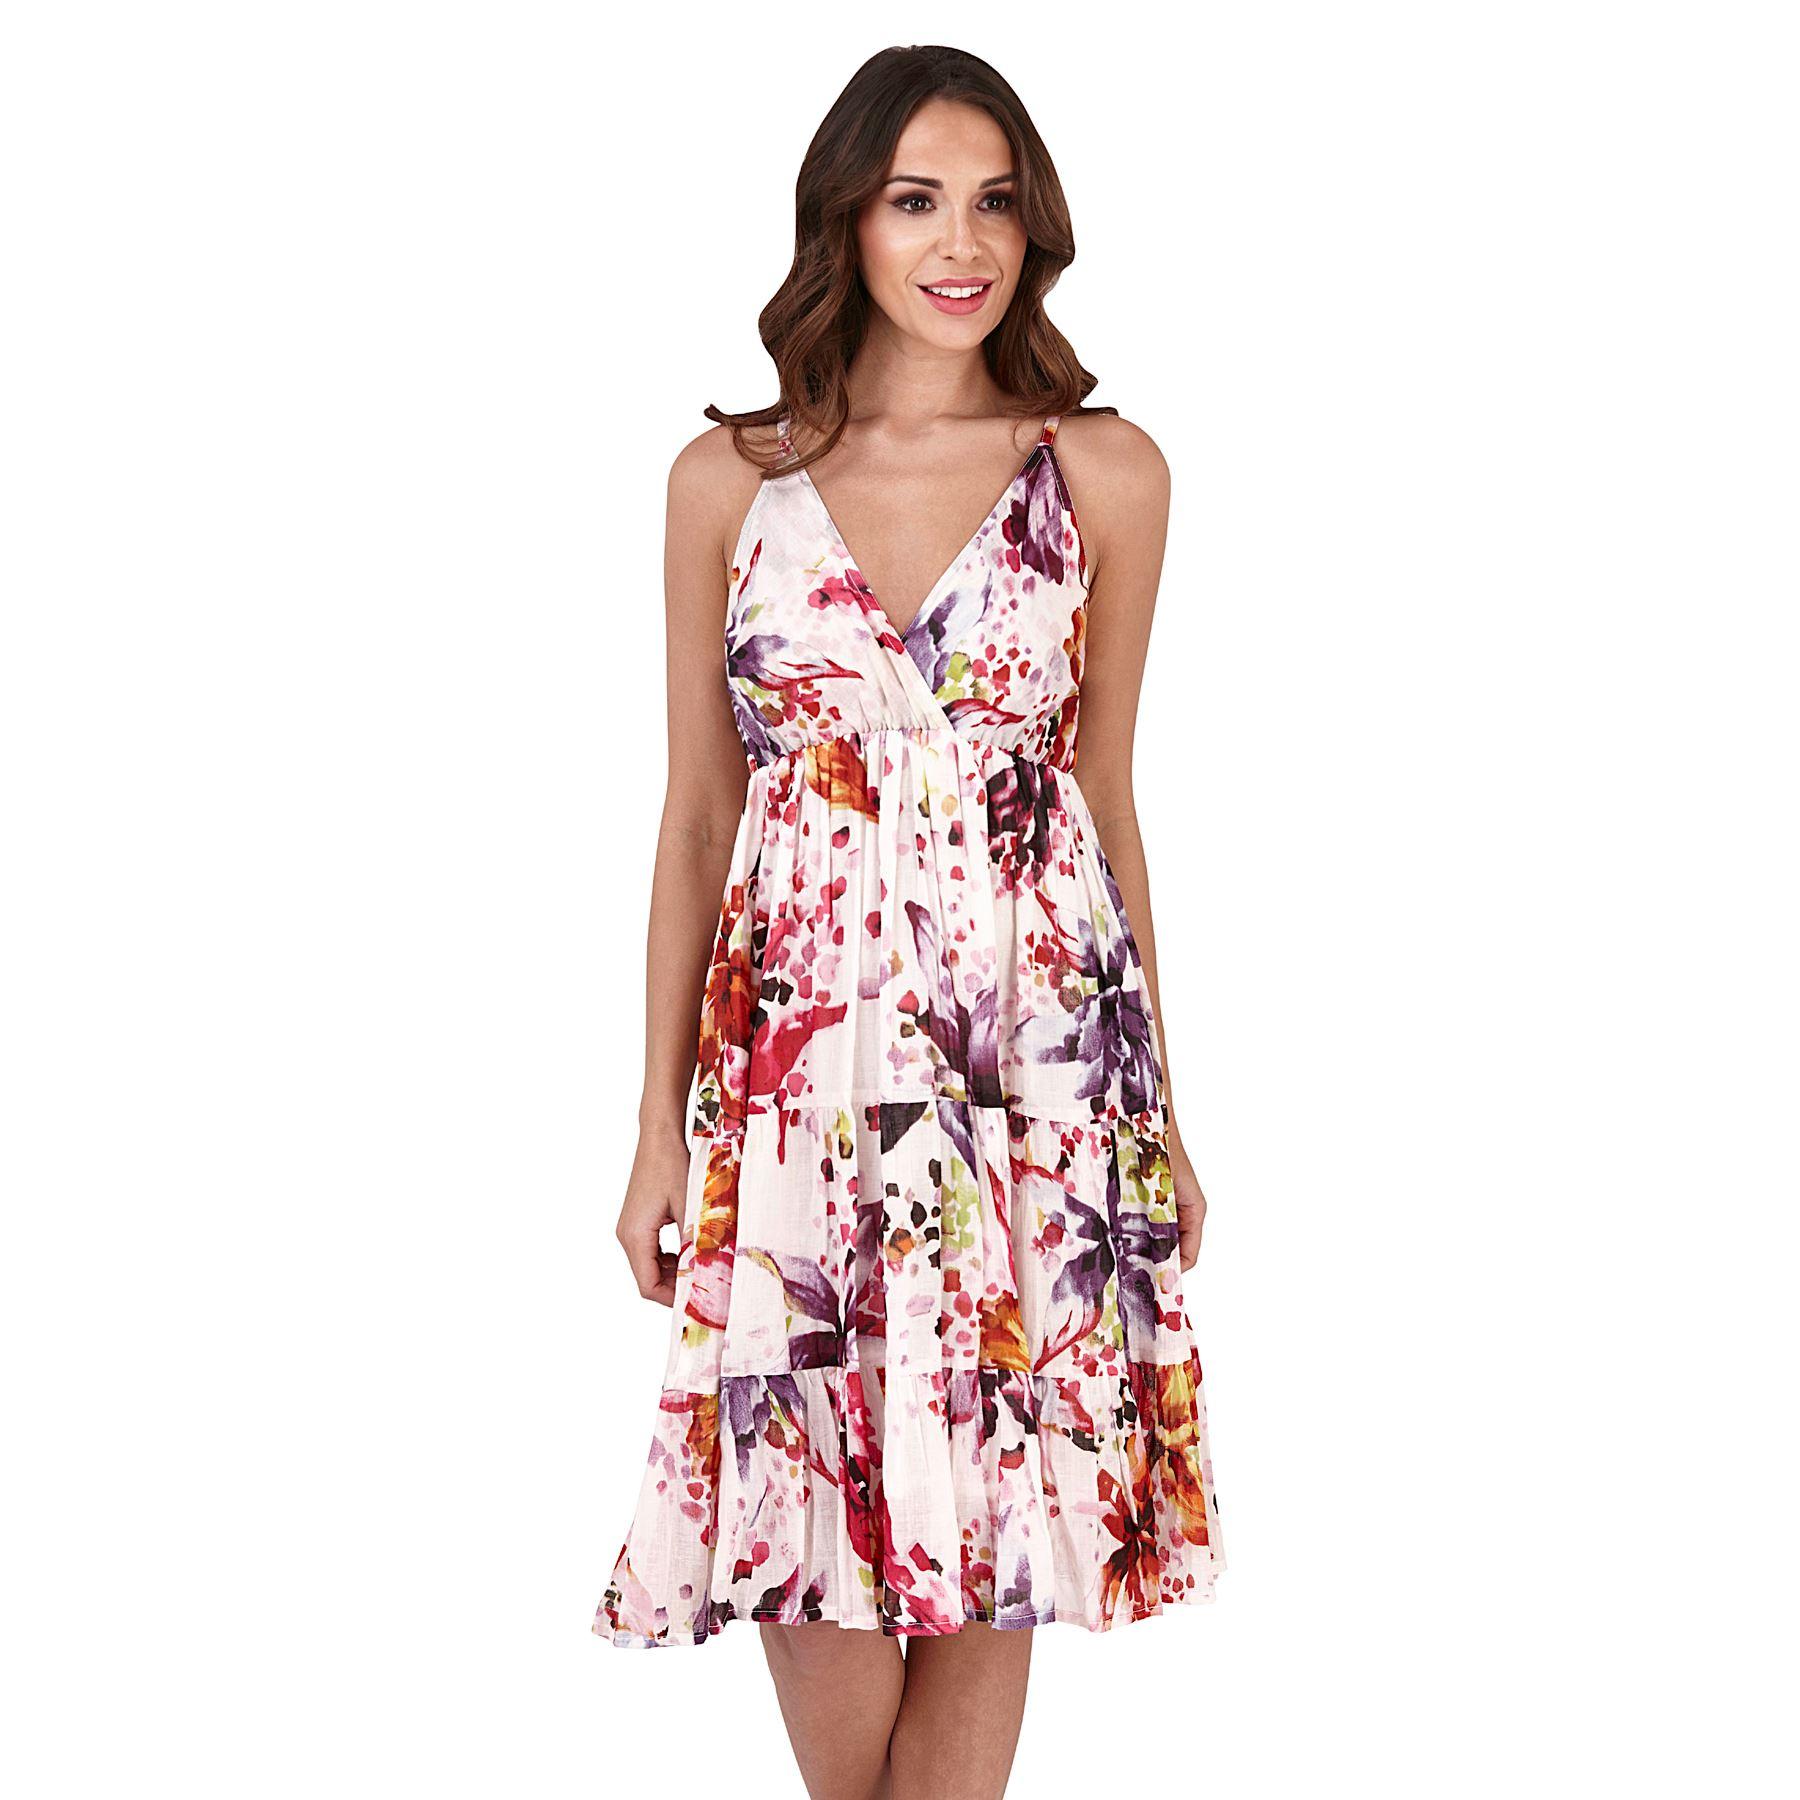 Ladies 100% Cotton Summer Beach Sun Dress Size 8 10 12 14 ...